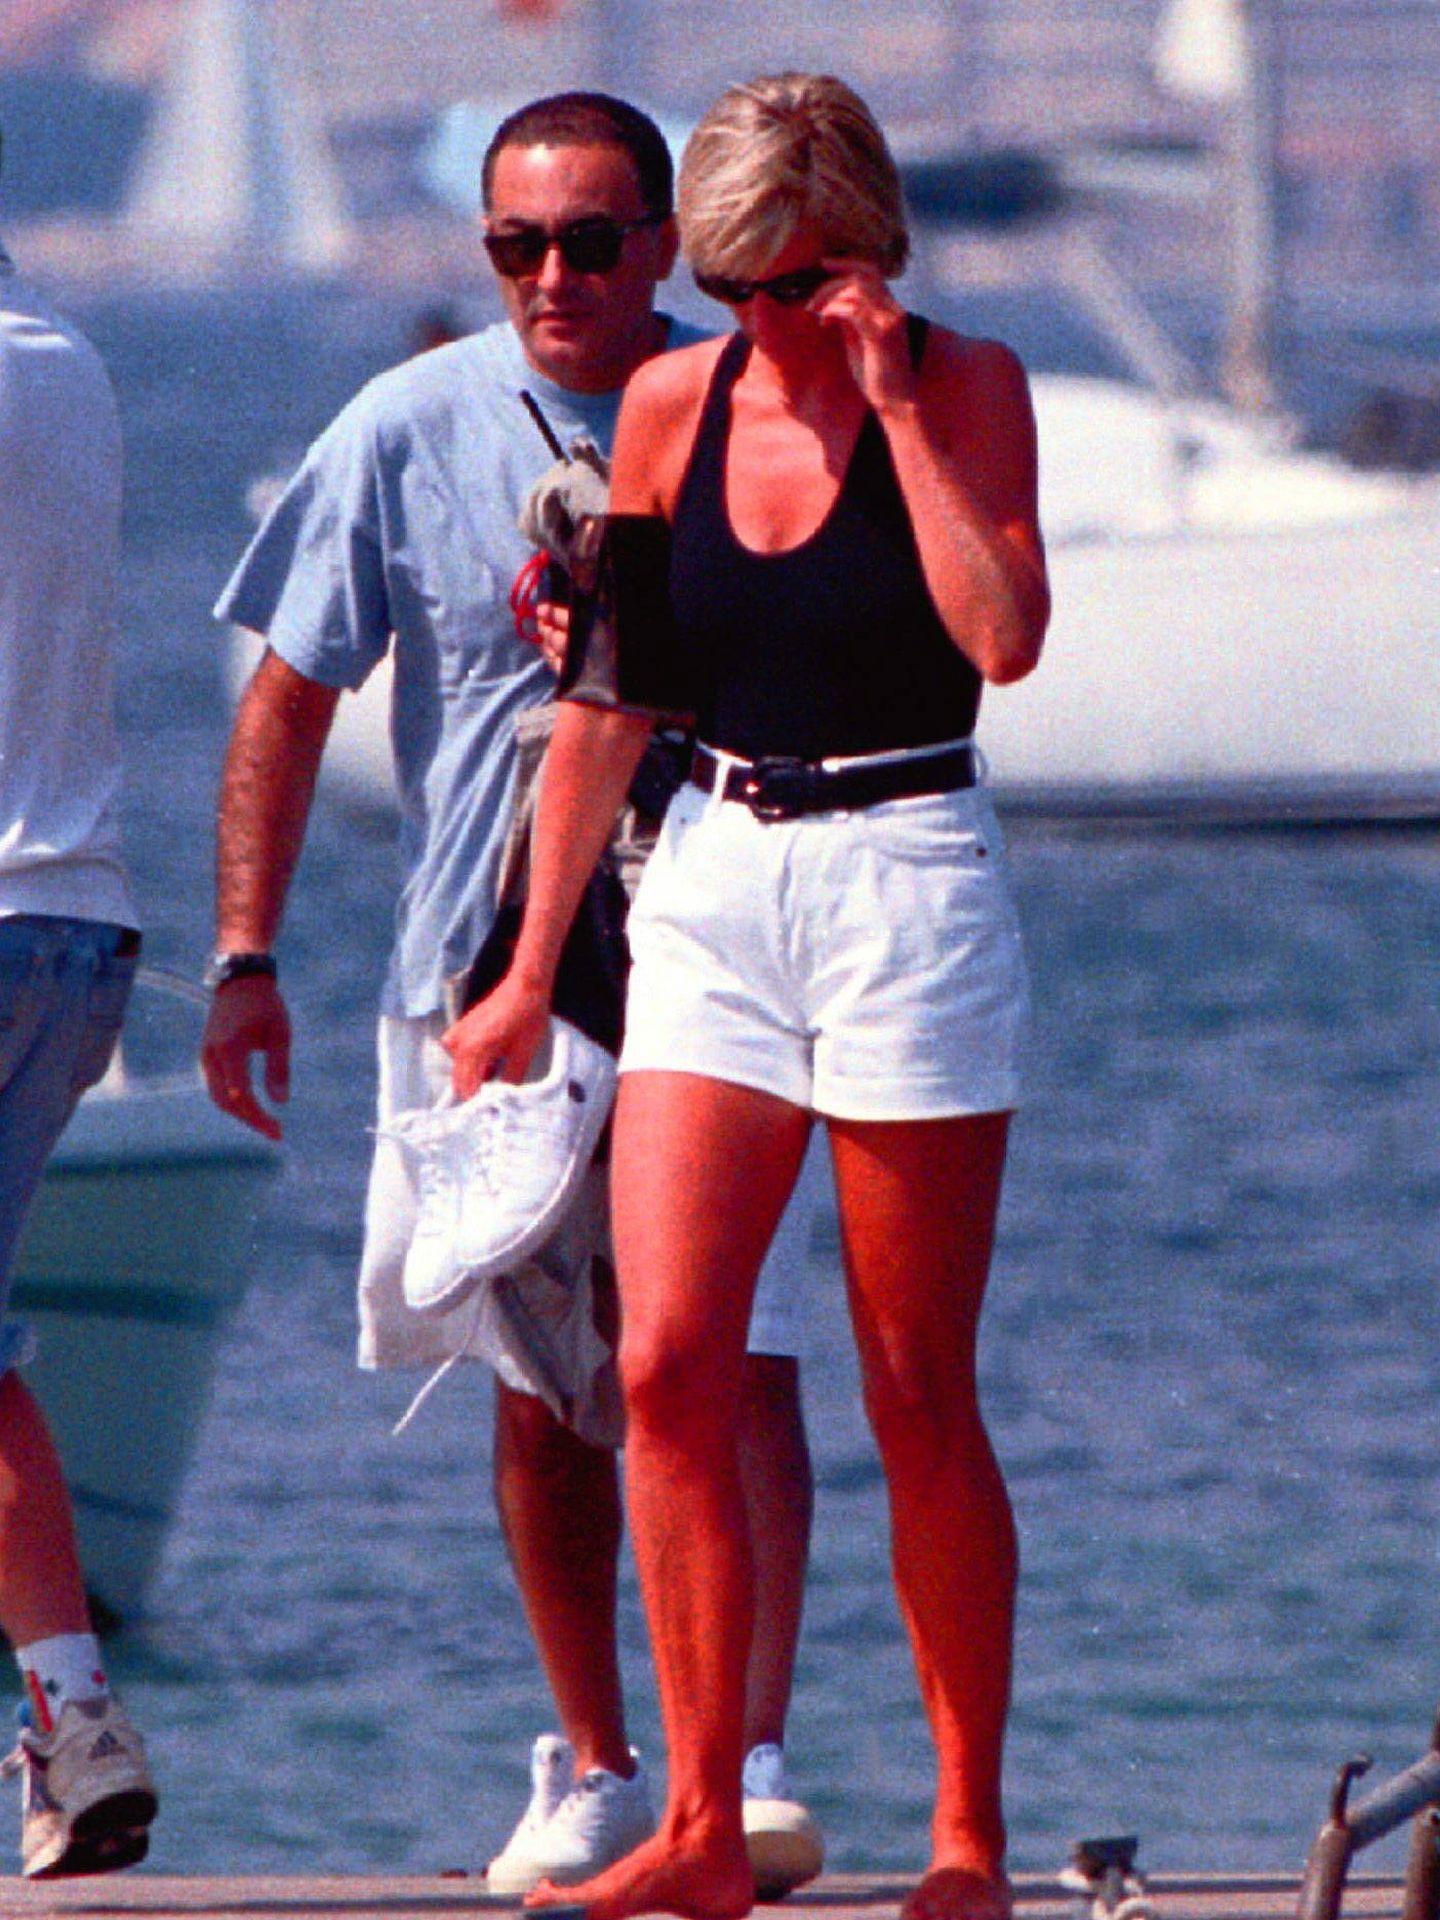 Diana de Gales, junto a Dodi Al Fayed en Saint Tropez. (Cordon Press)